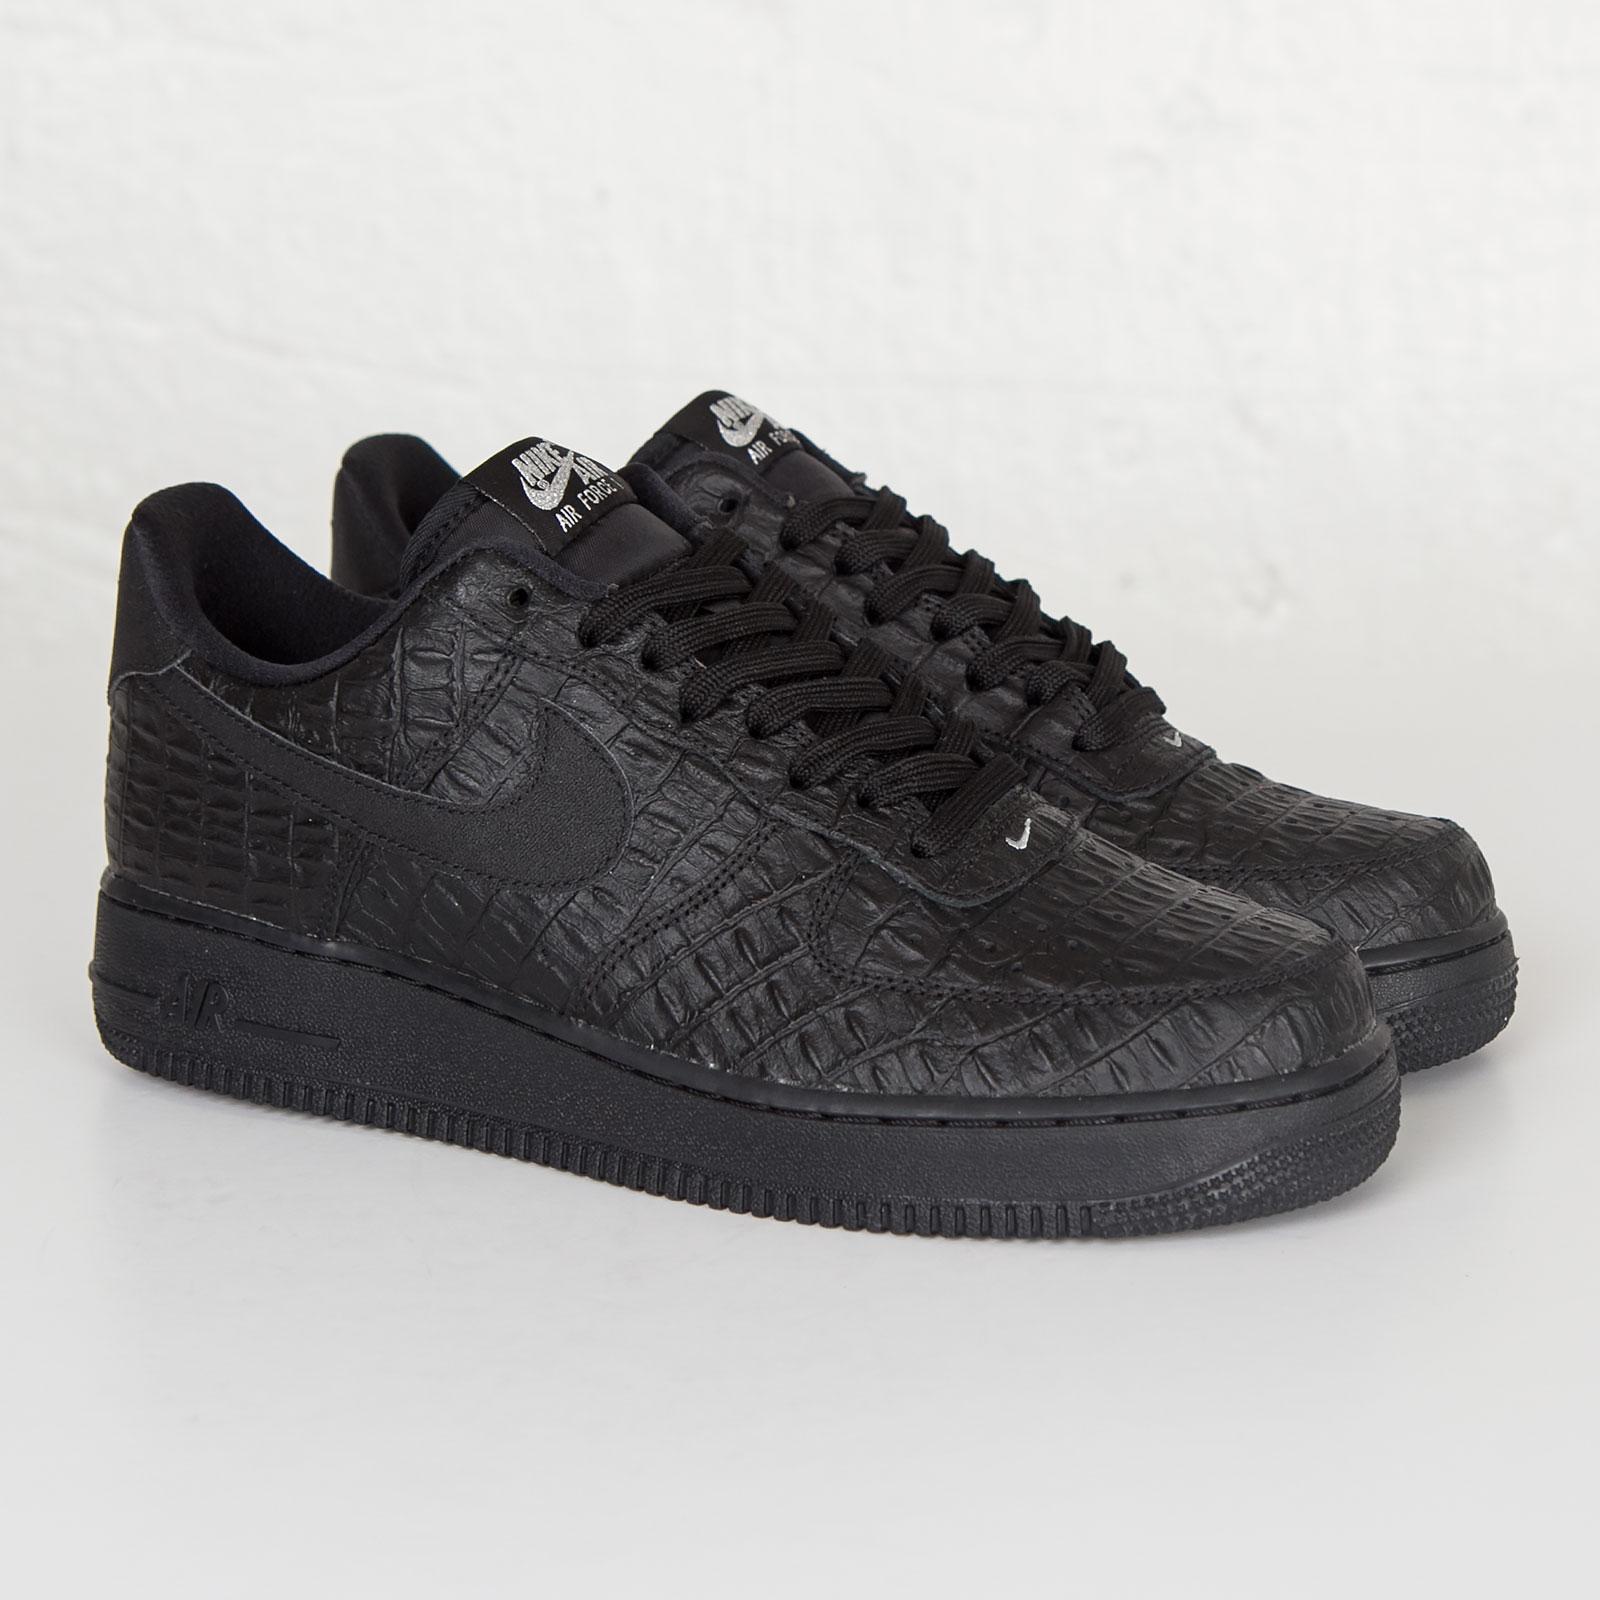 Nike Air Force 1 07 LV8 - 718152-007 - Sneakersnstuff  61c403a235de